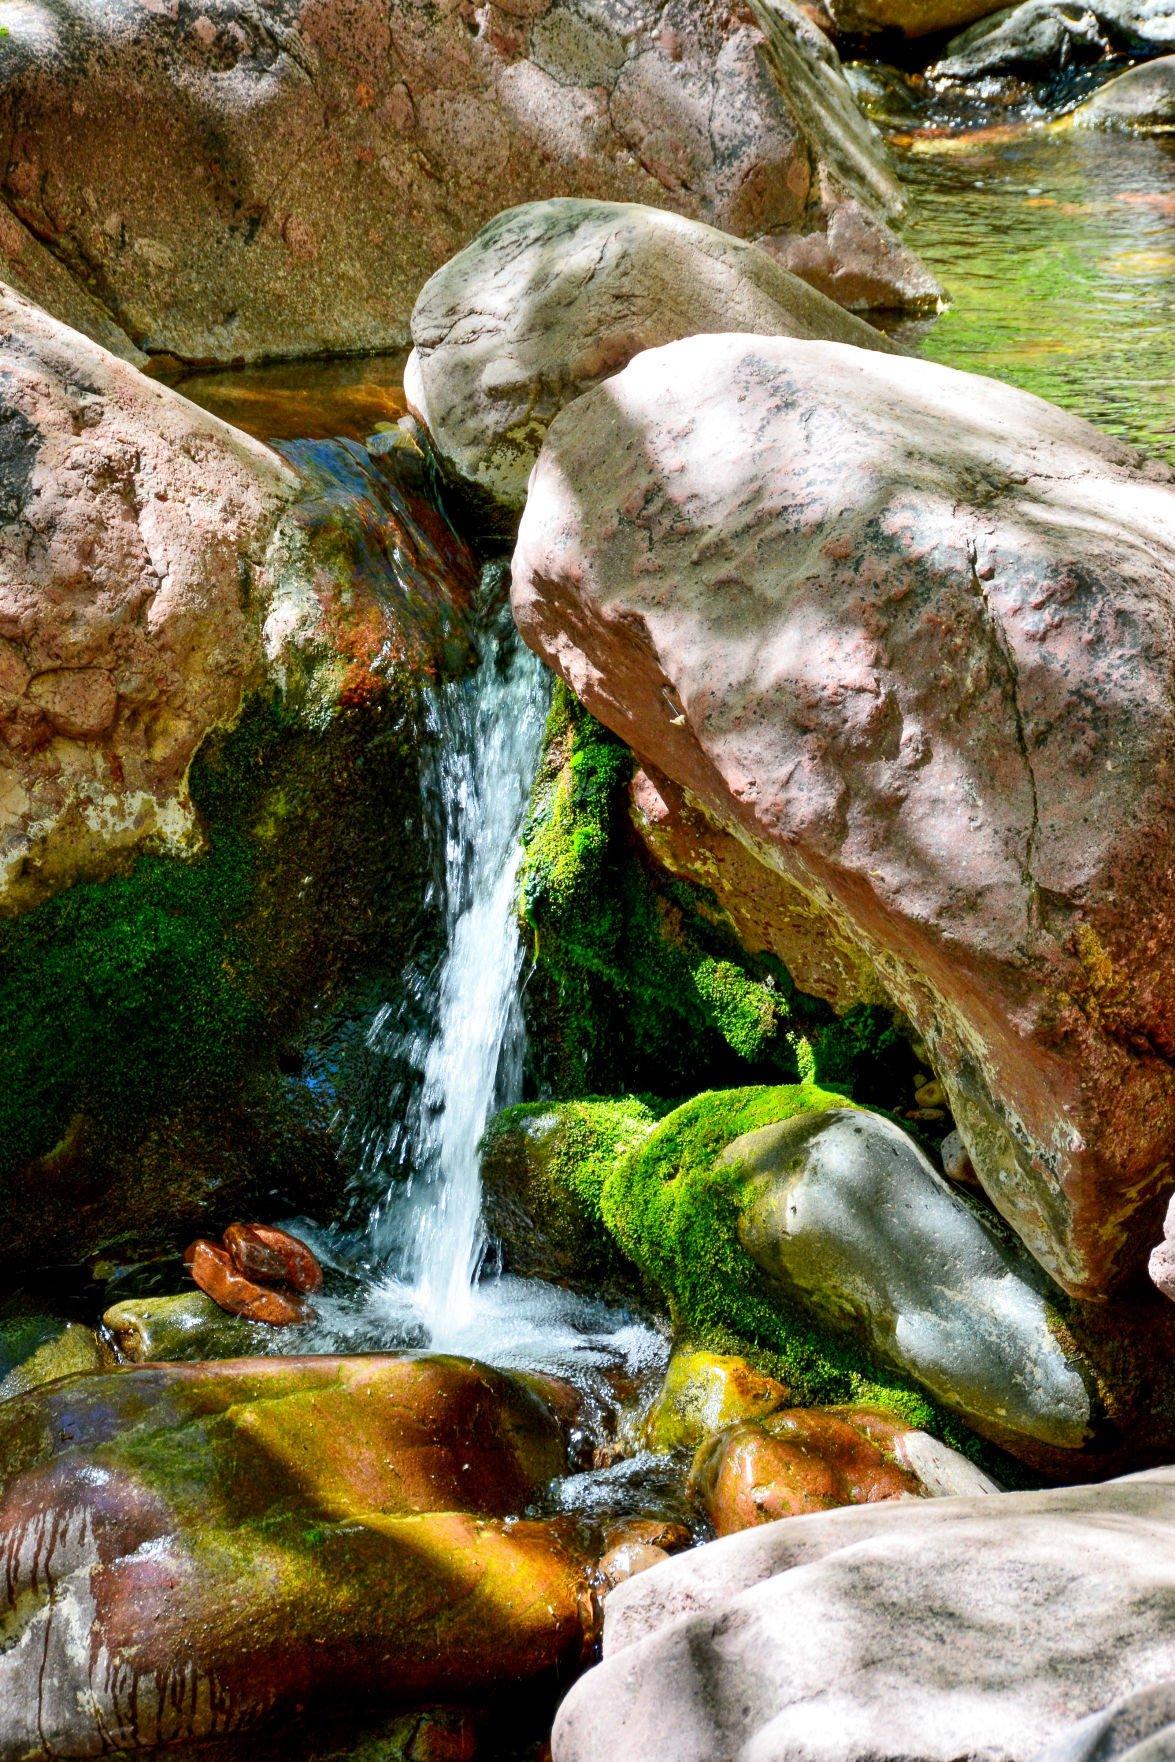 Pine Creek Trail TNB DSC_6561 4K res personal photo Pia Wyer.jpg